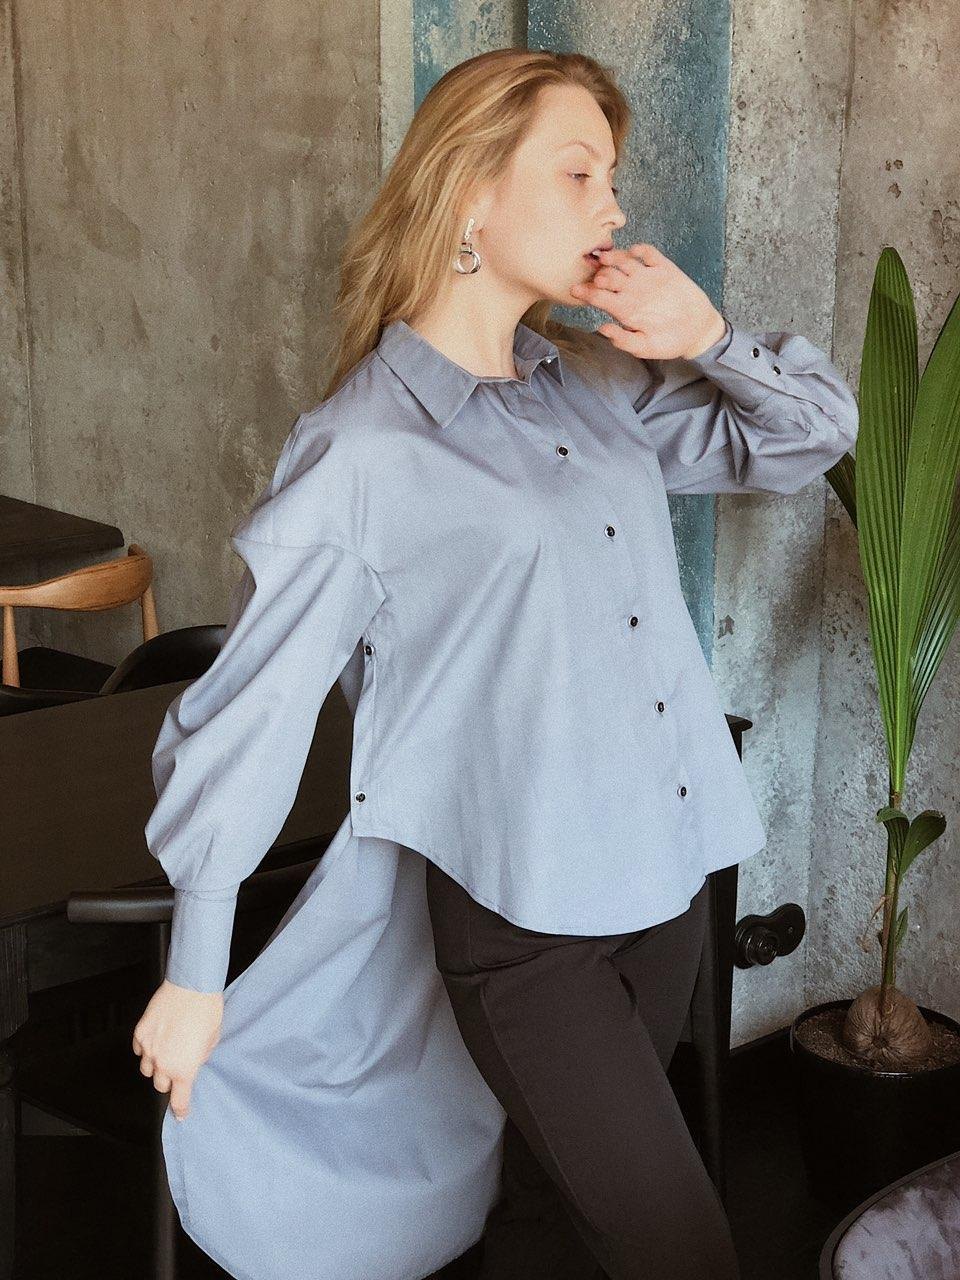 Женская блузка со шлейфом (р. XS-S-M)